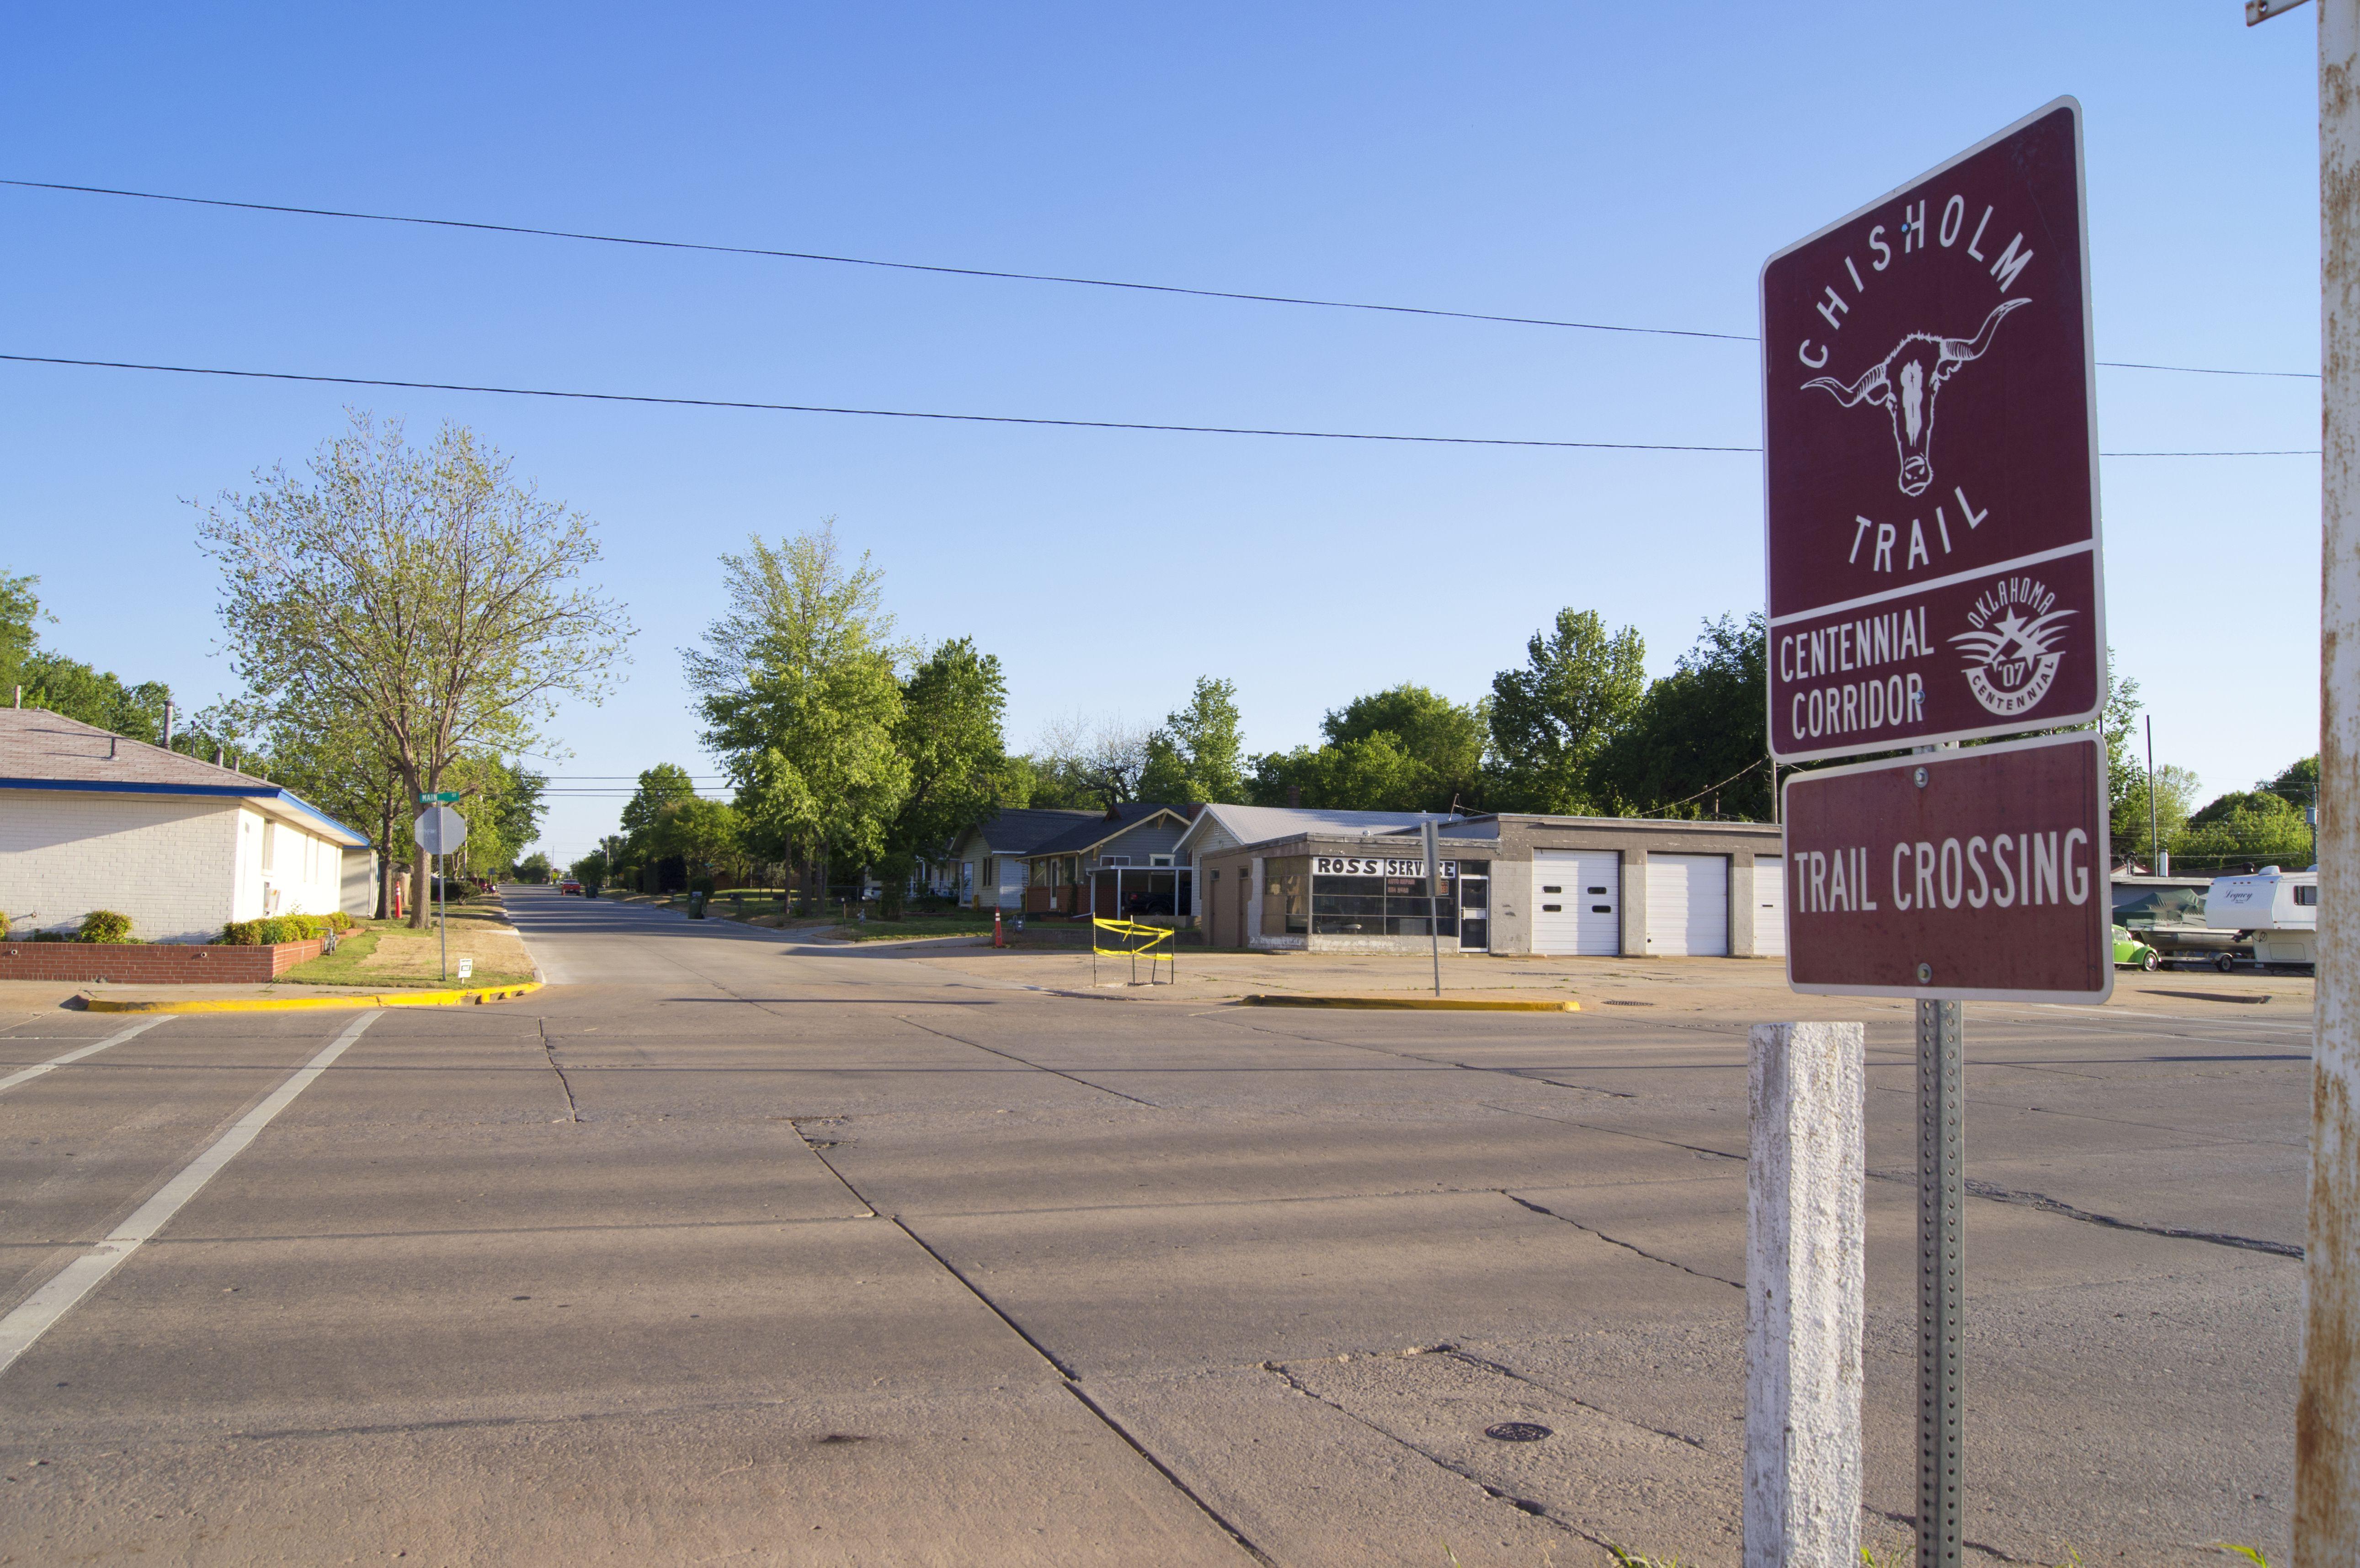 7 Best Things To Do In Yukon Oklahoma